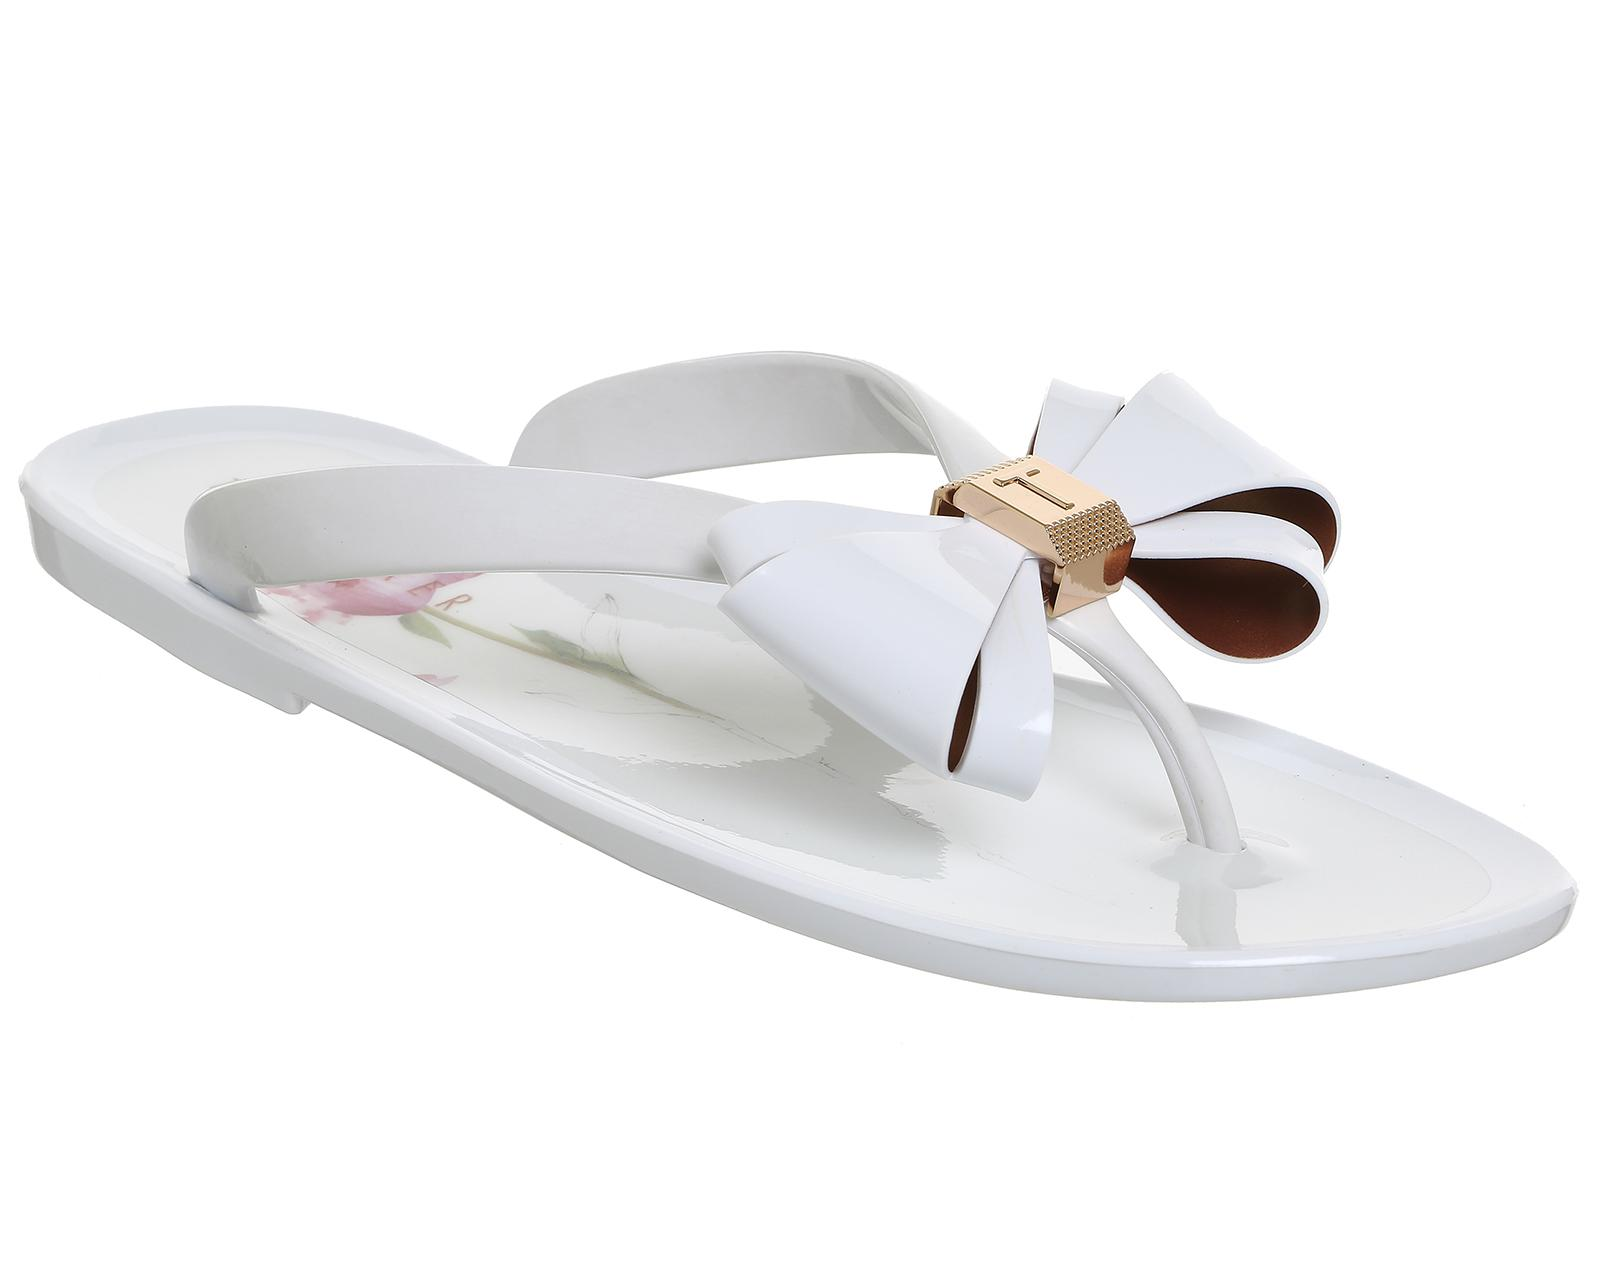 3675558a5f76cb Lyst - Ted Baker Rueday Flip Flops in White